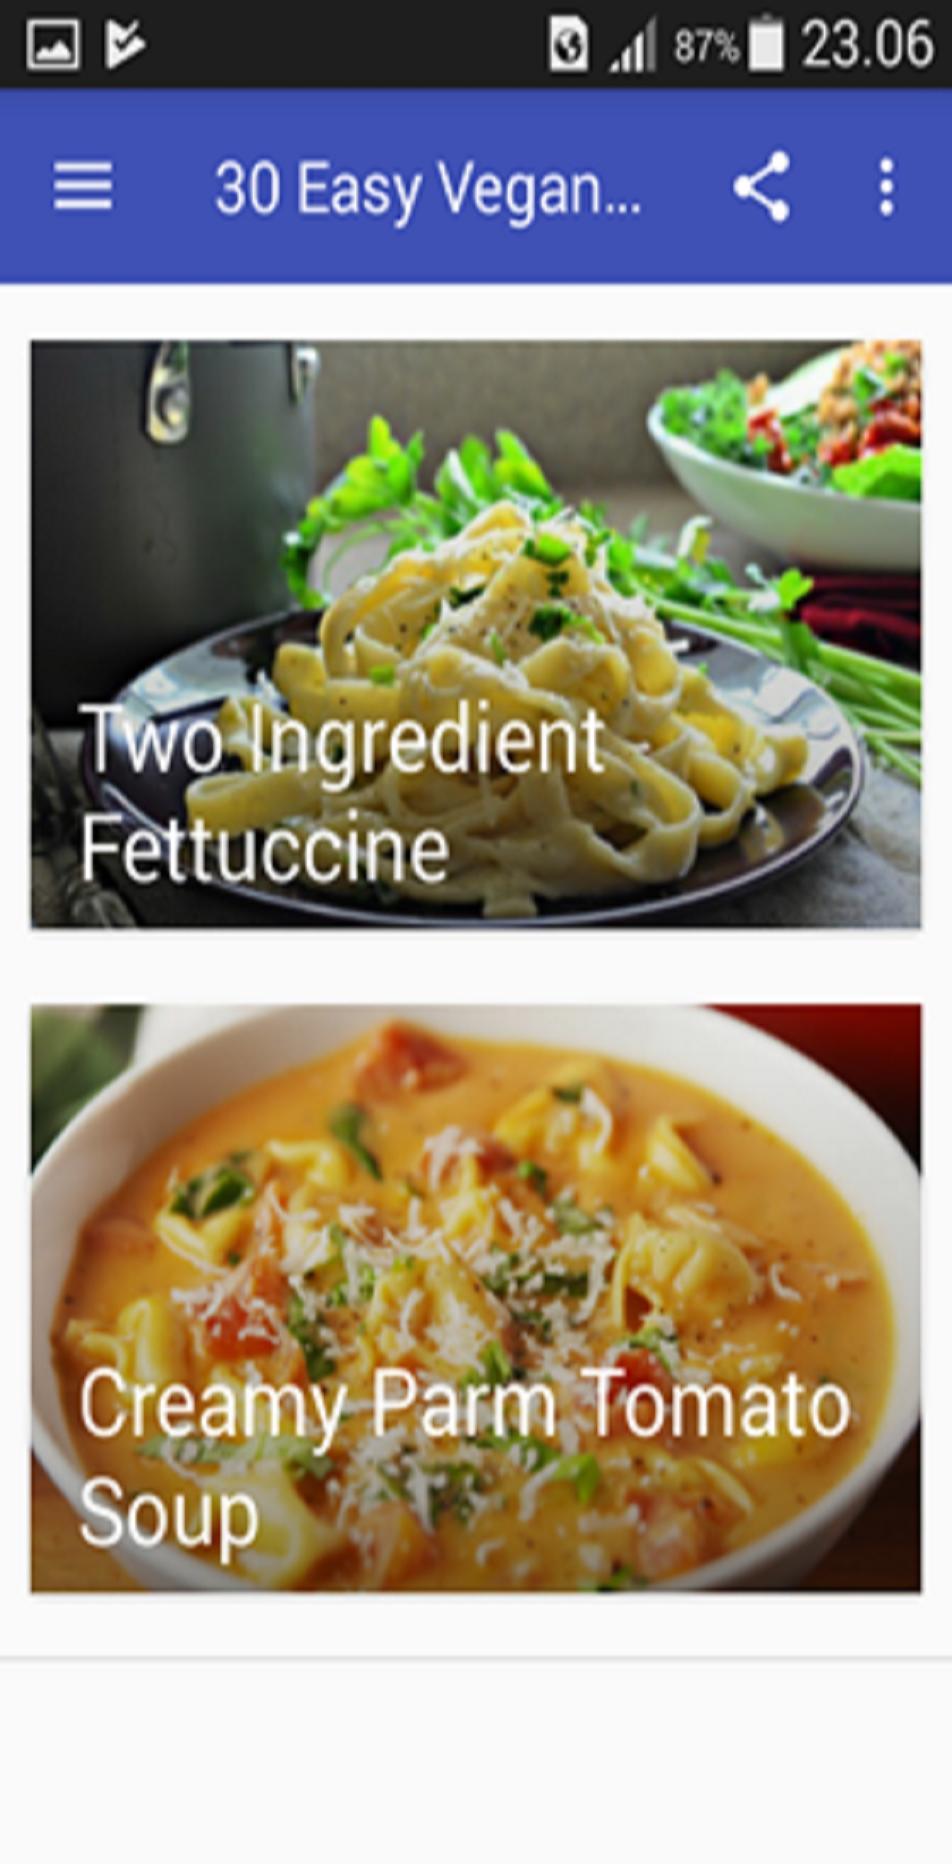 30+ Vegan Recipes Free 2